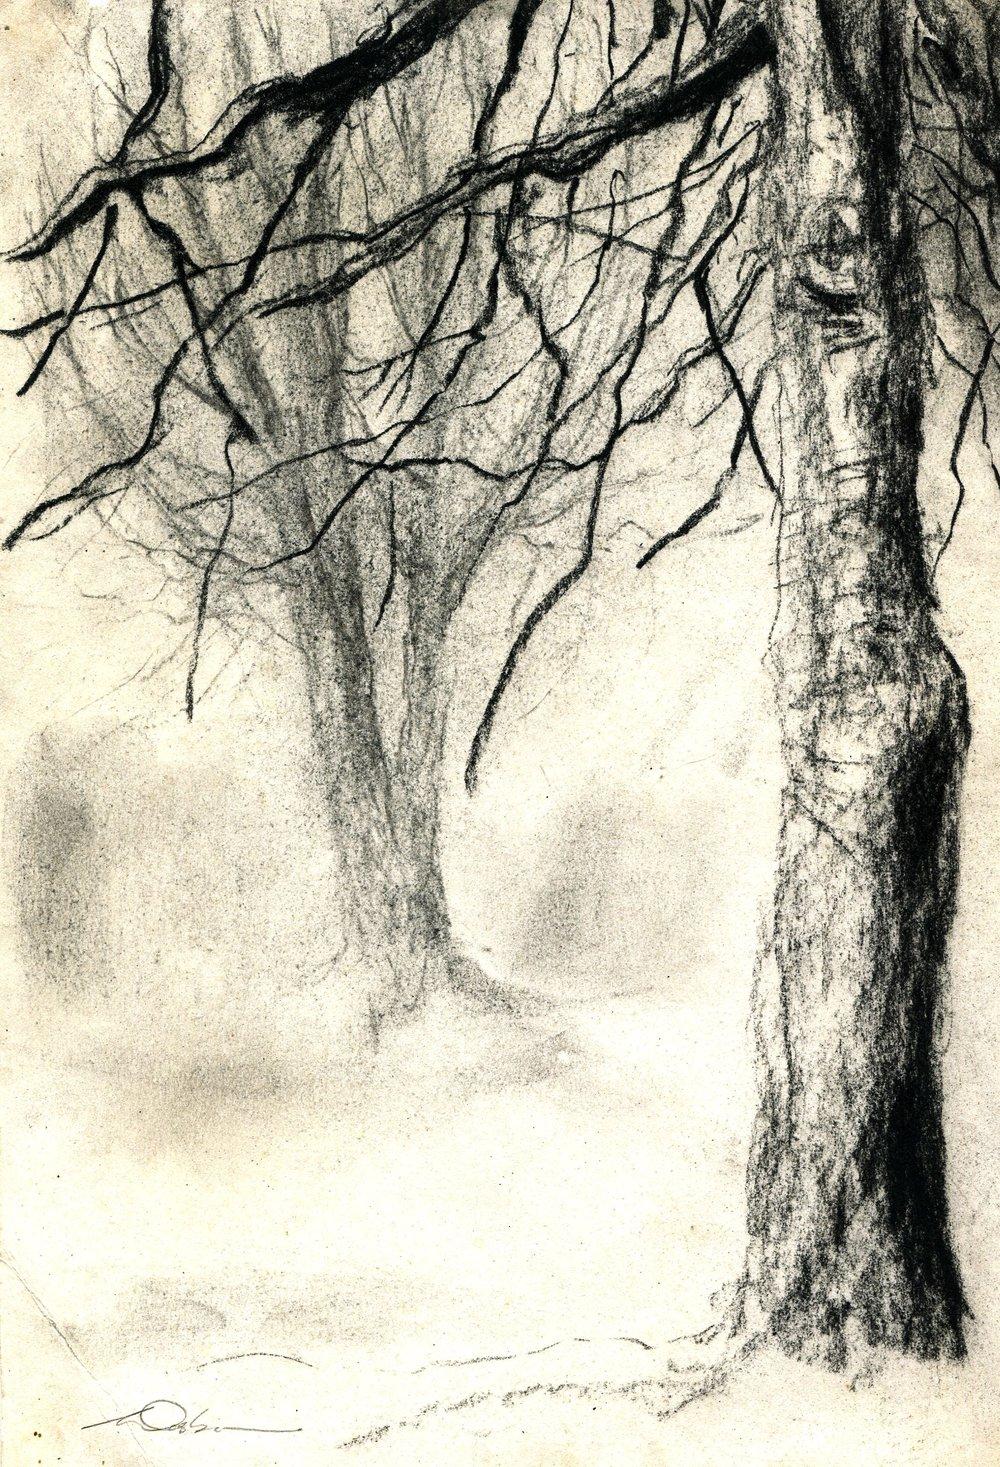 88c Saskia Osborne, Winter 3, Charcoal & conte on paper